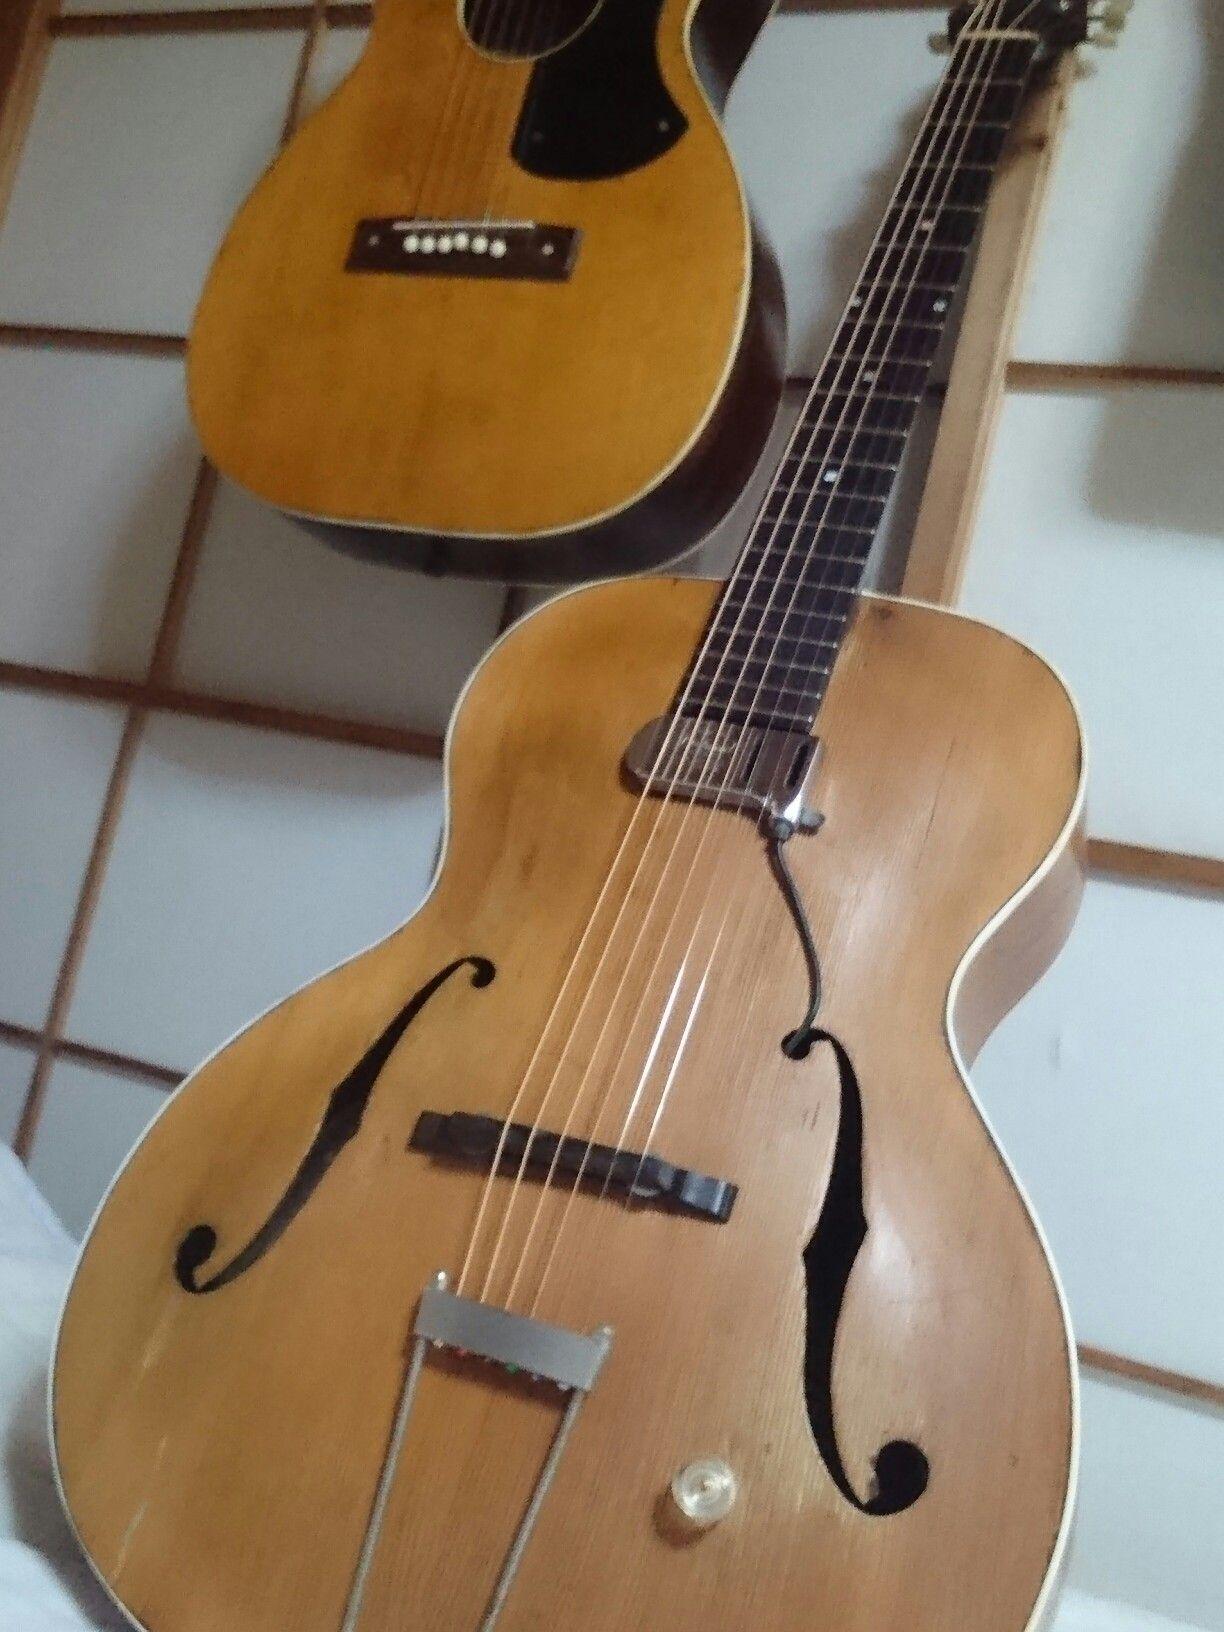 Epiphone Zenith Acoustic Guitar Guitar Epiphone Acoustic Guitar